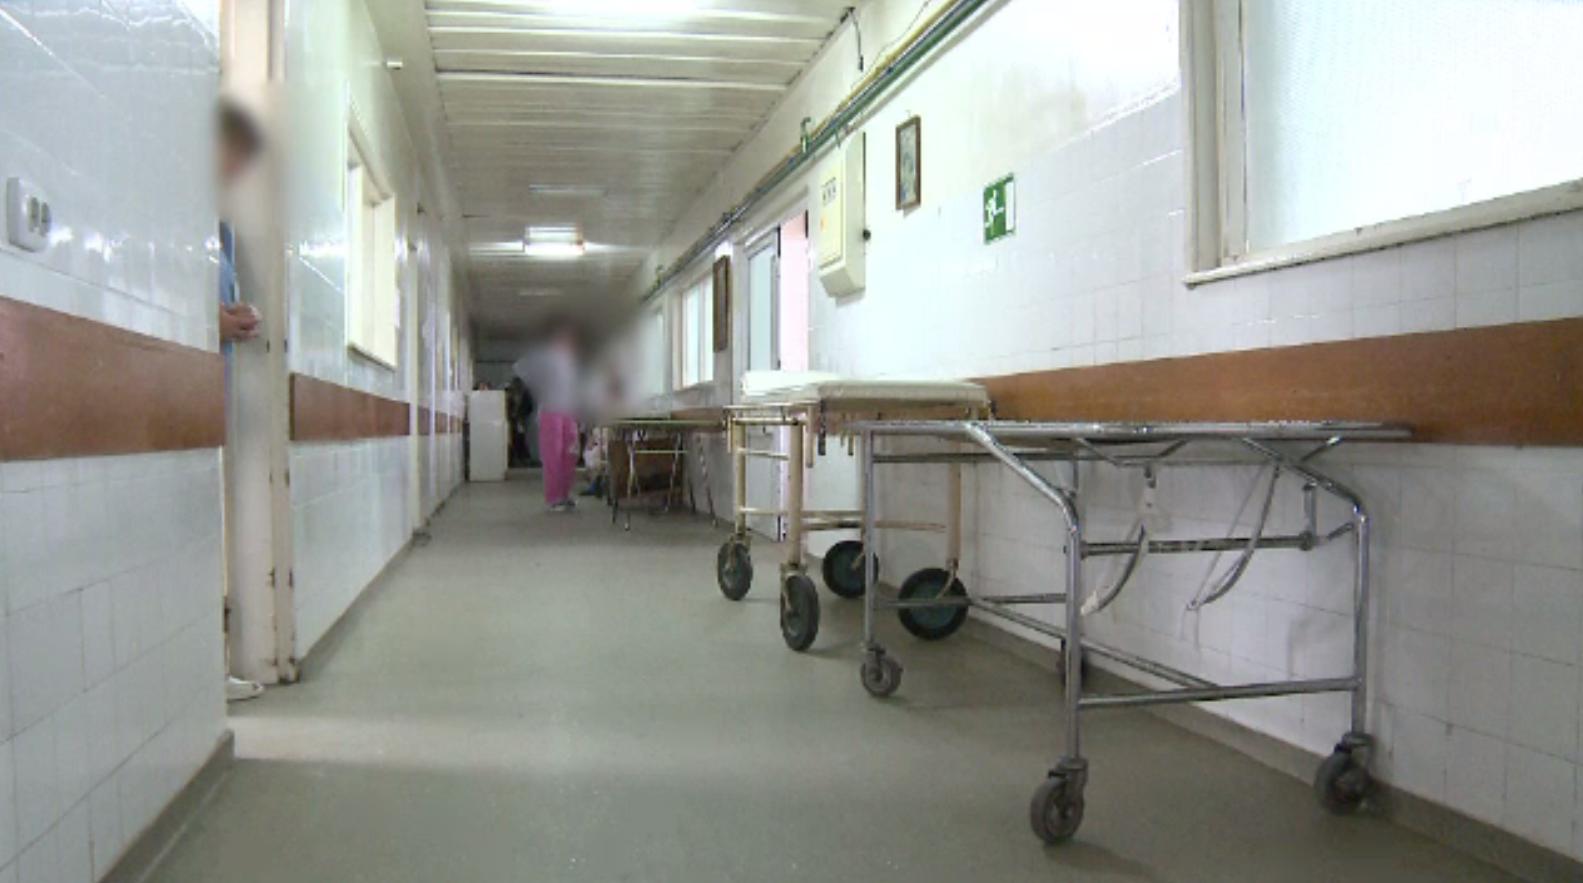 Nereguli grave la Spitalul Bagdasar Arseni. Mărturia unui angajat, sub protecția anonimatului